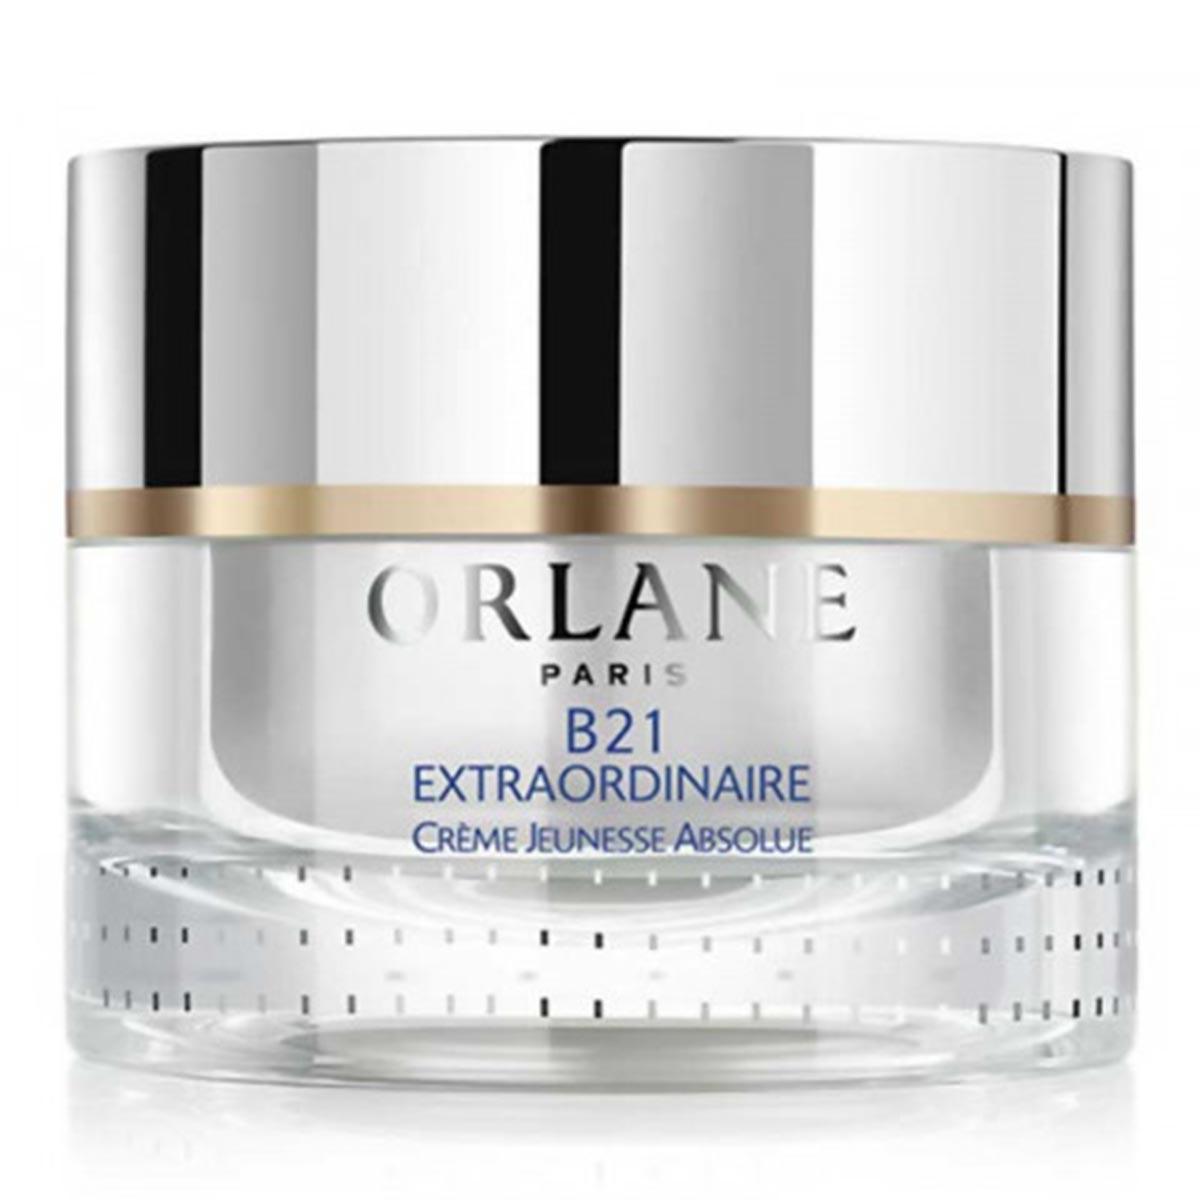 Orlane b21 extraordinaire creme jeunesse absolue 50ml